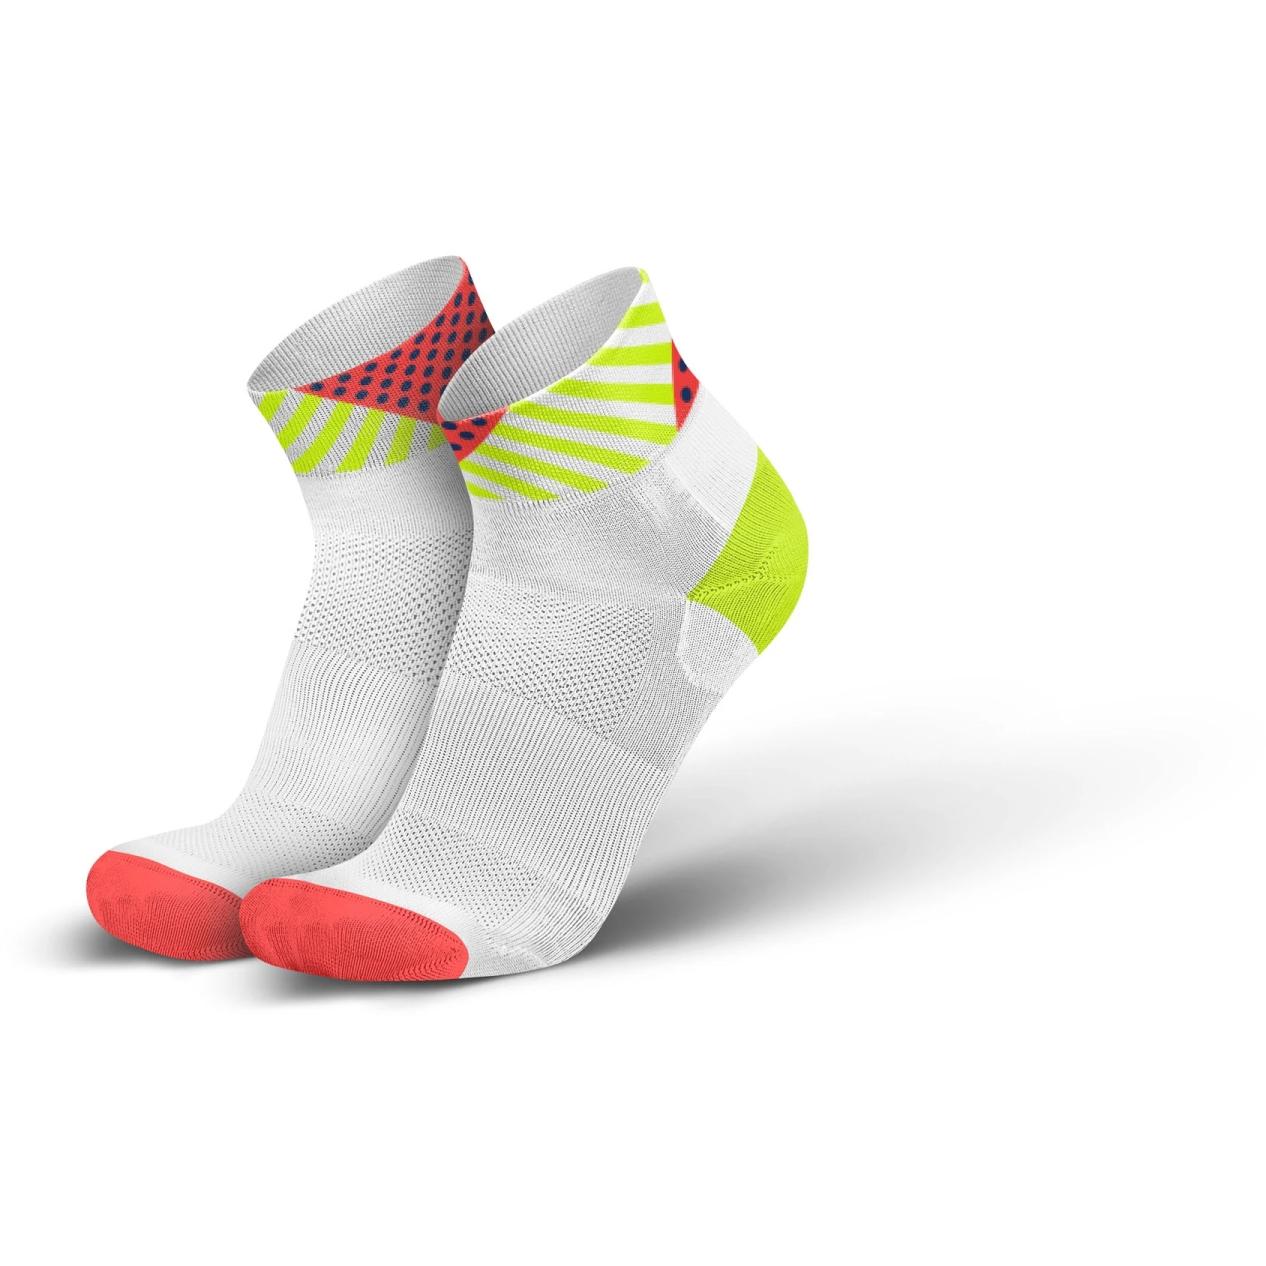 Produktbild von INCYLENCE Ultralight Wild Short Socken - Canary